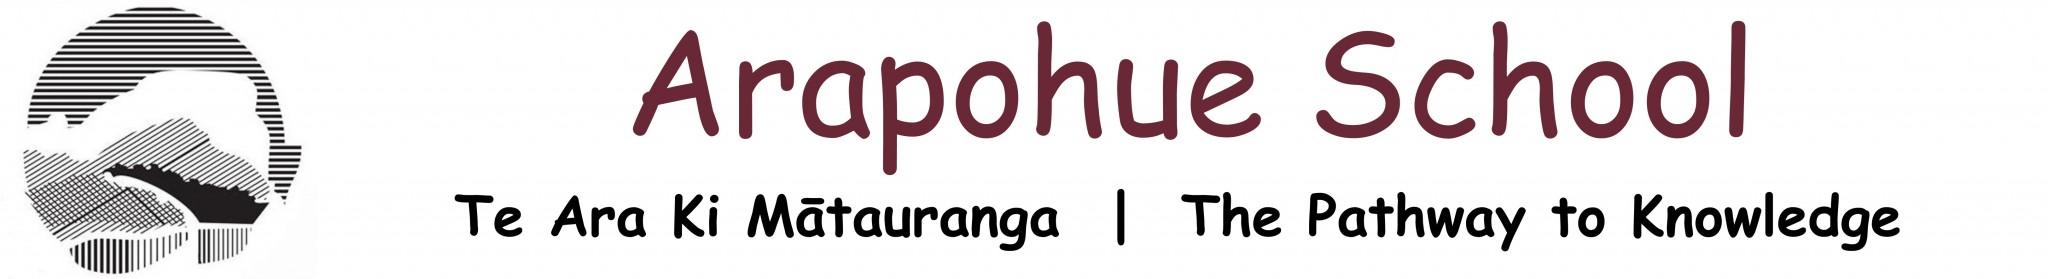 Arapohue School Logo